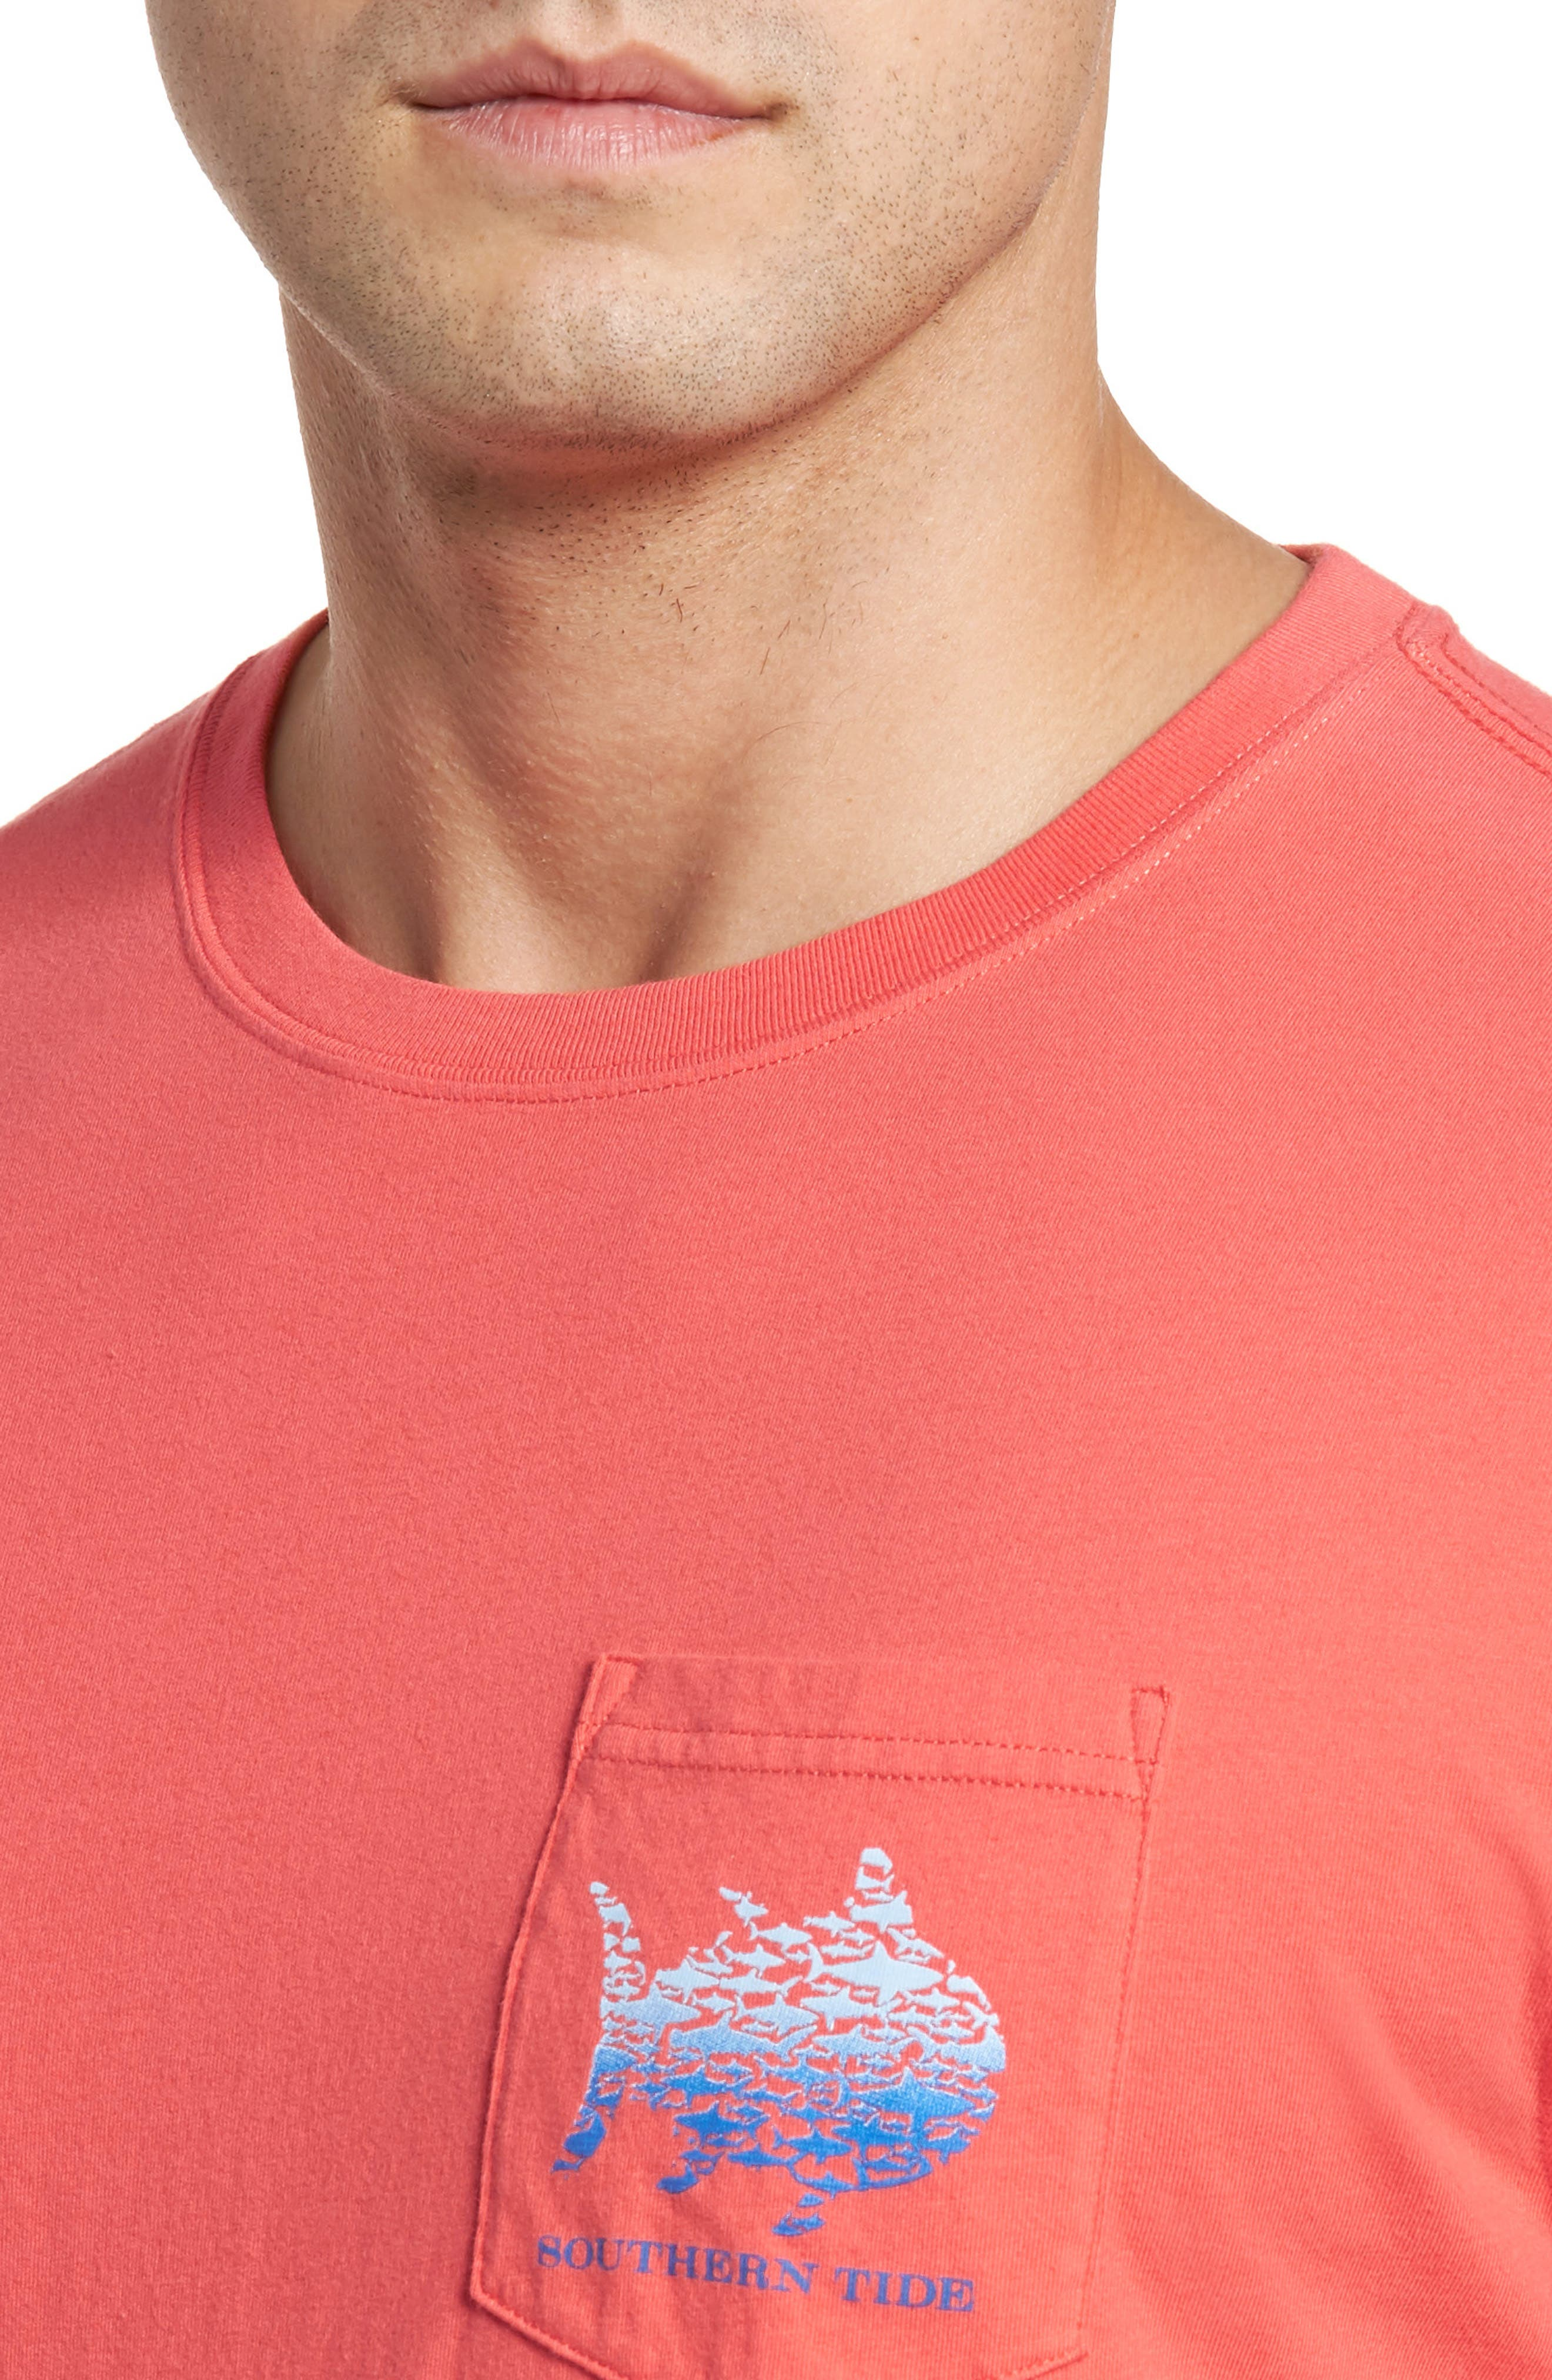 School Of Sharks Crewneck Cotton T-Shirt,                             Alternate thumbnail 4, color,                             682